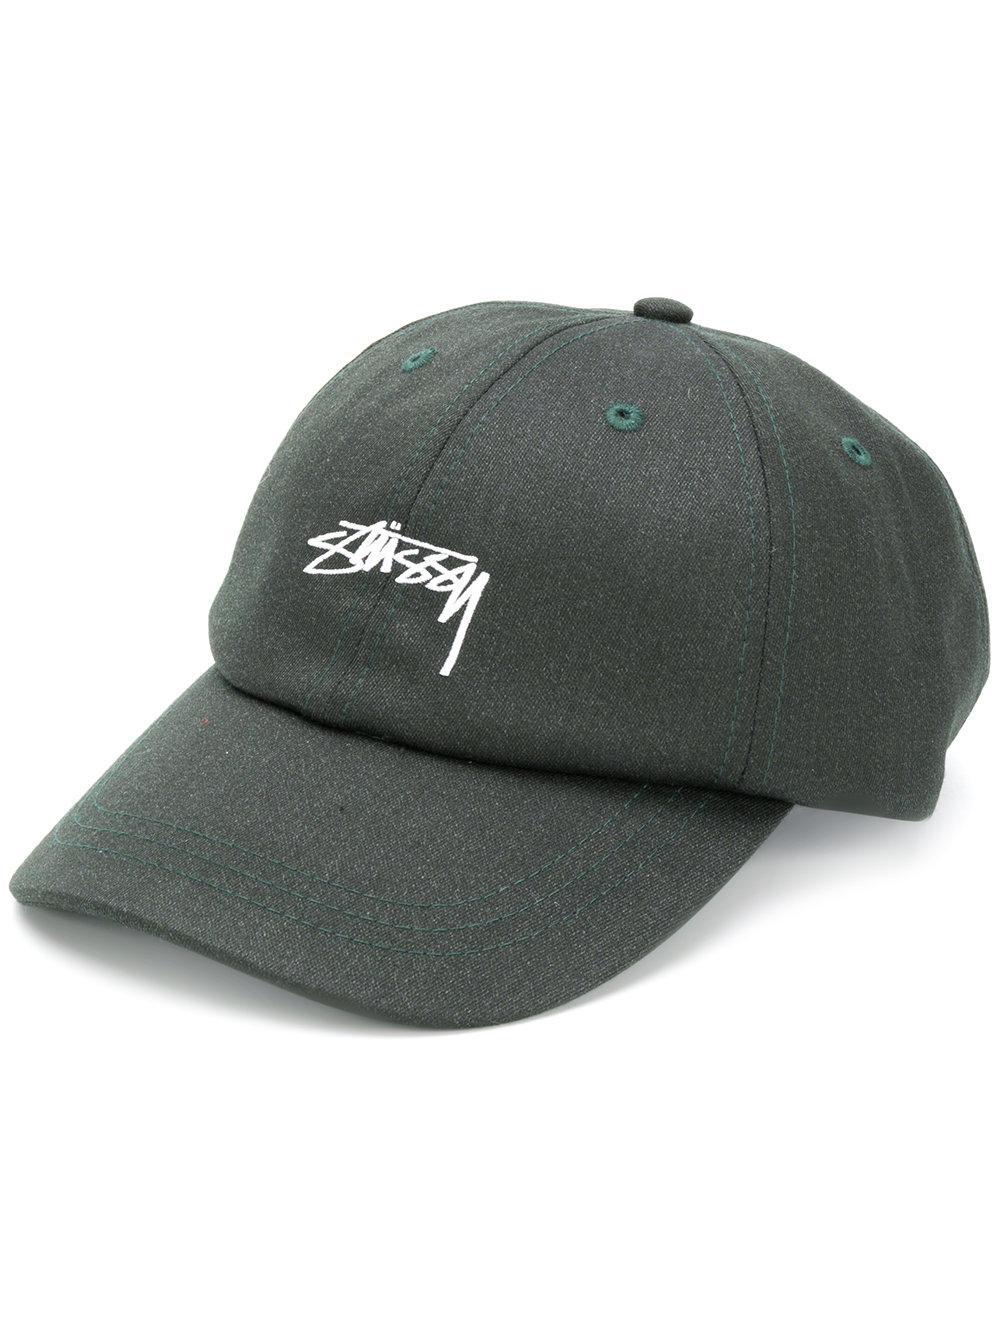 496fb19d95b31 Stussy Embroidered Logo Baseball Cap